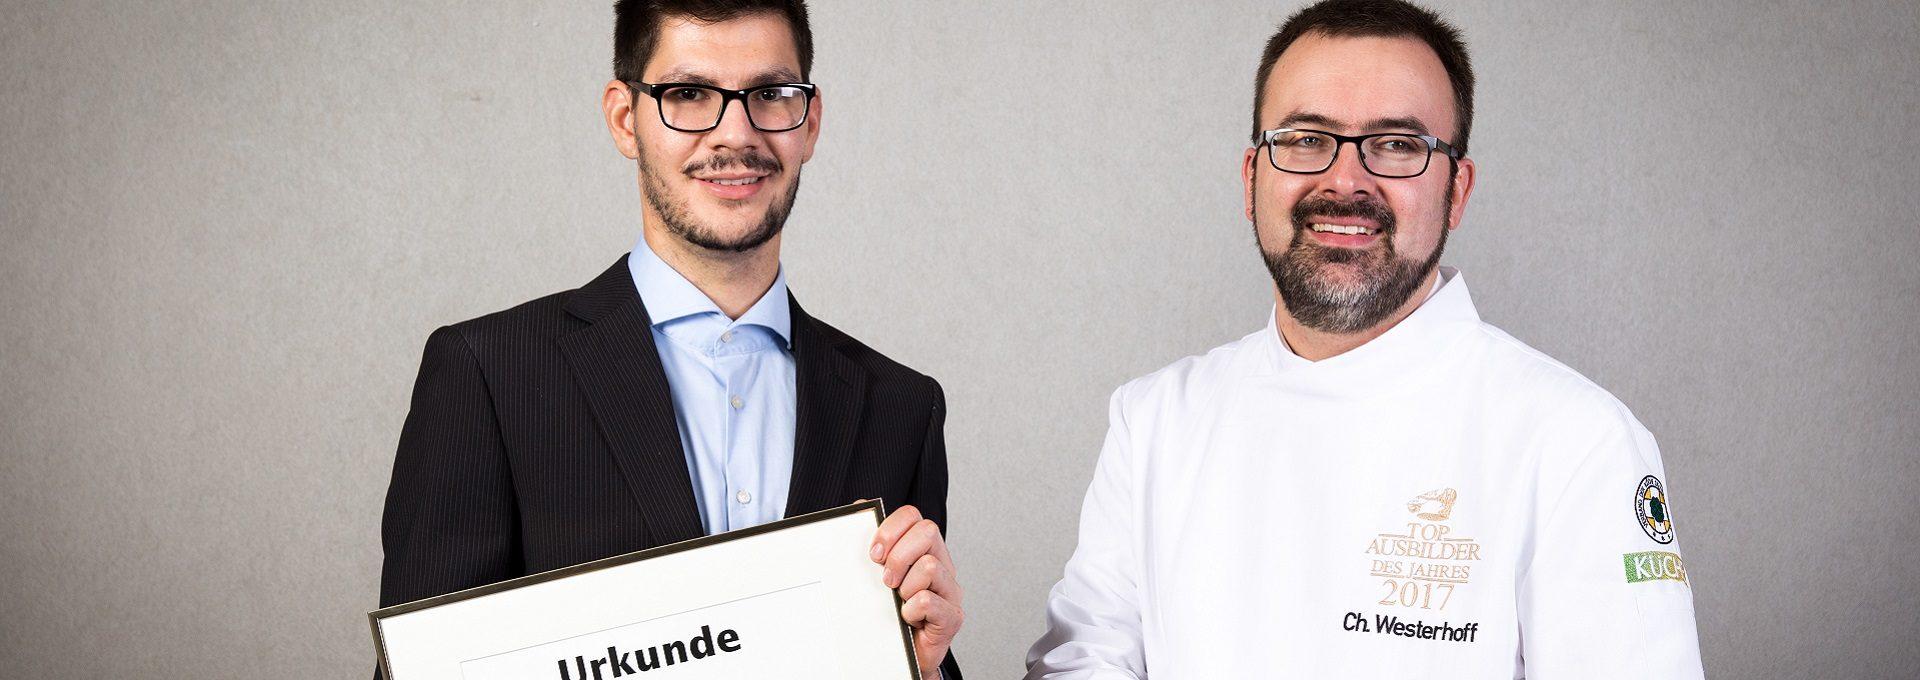 Aufnahme Christian Westerhoff, Tobias Friedl